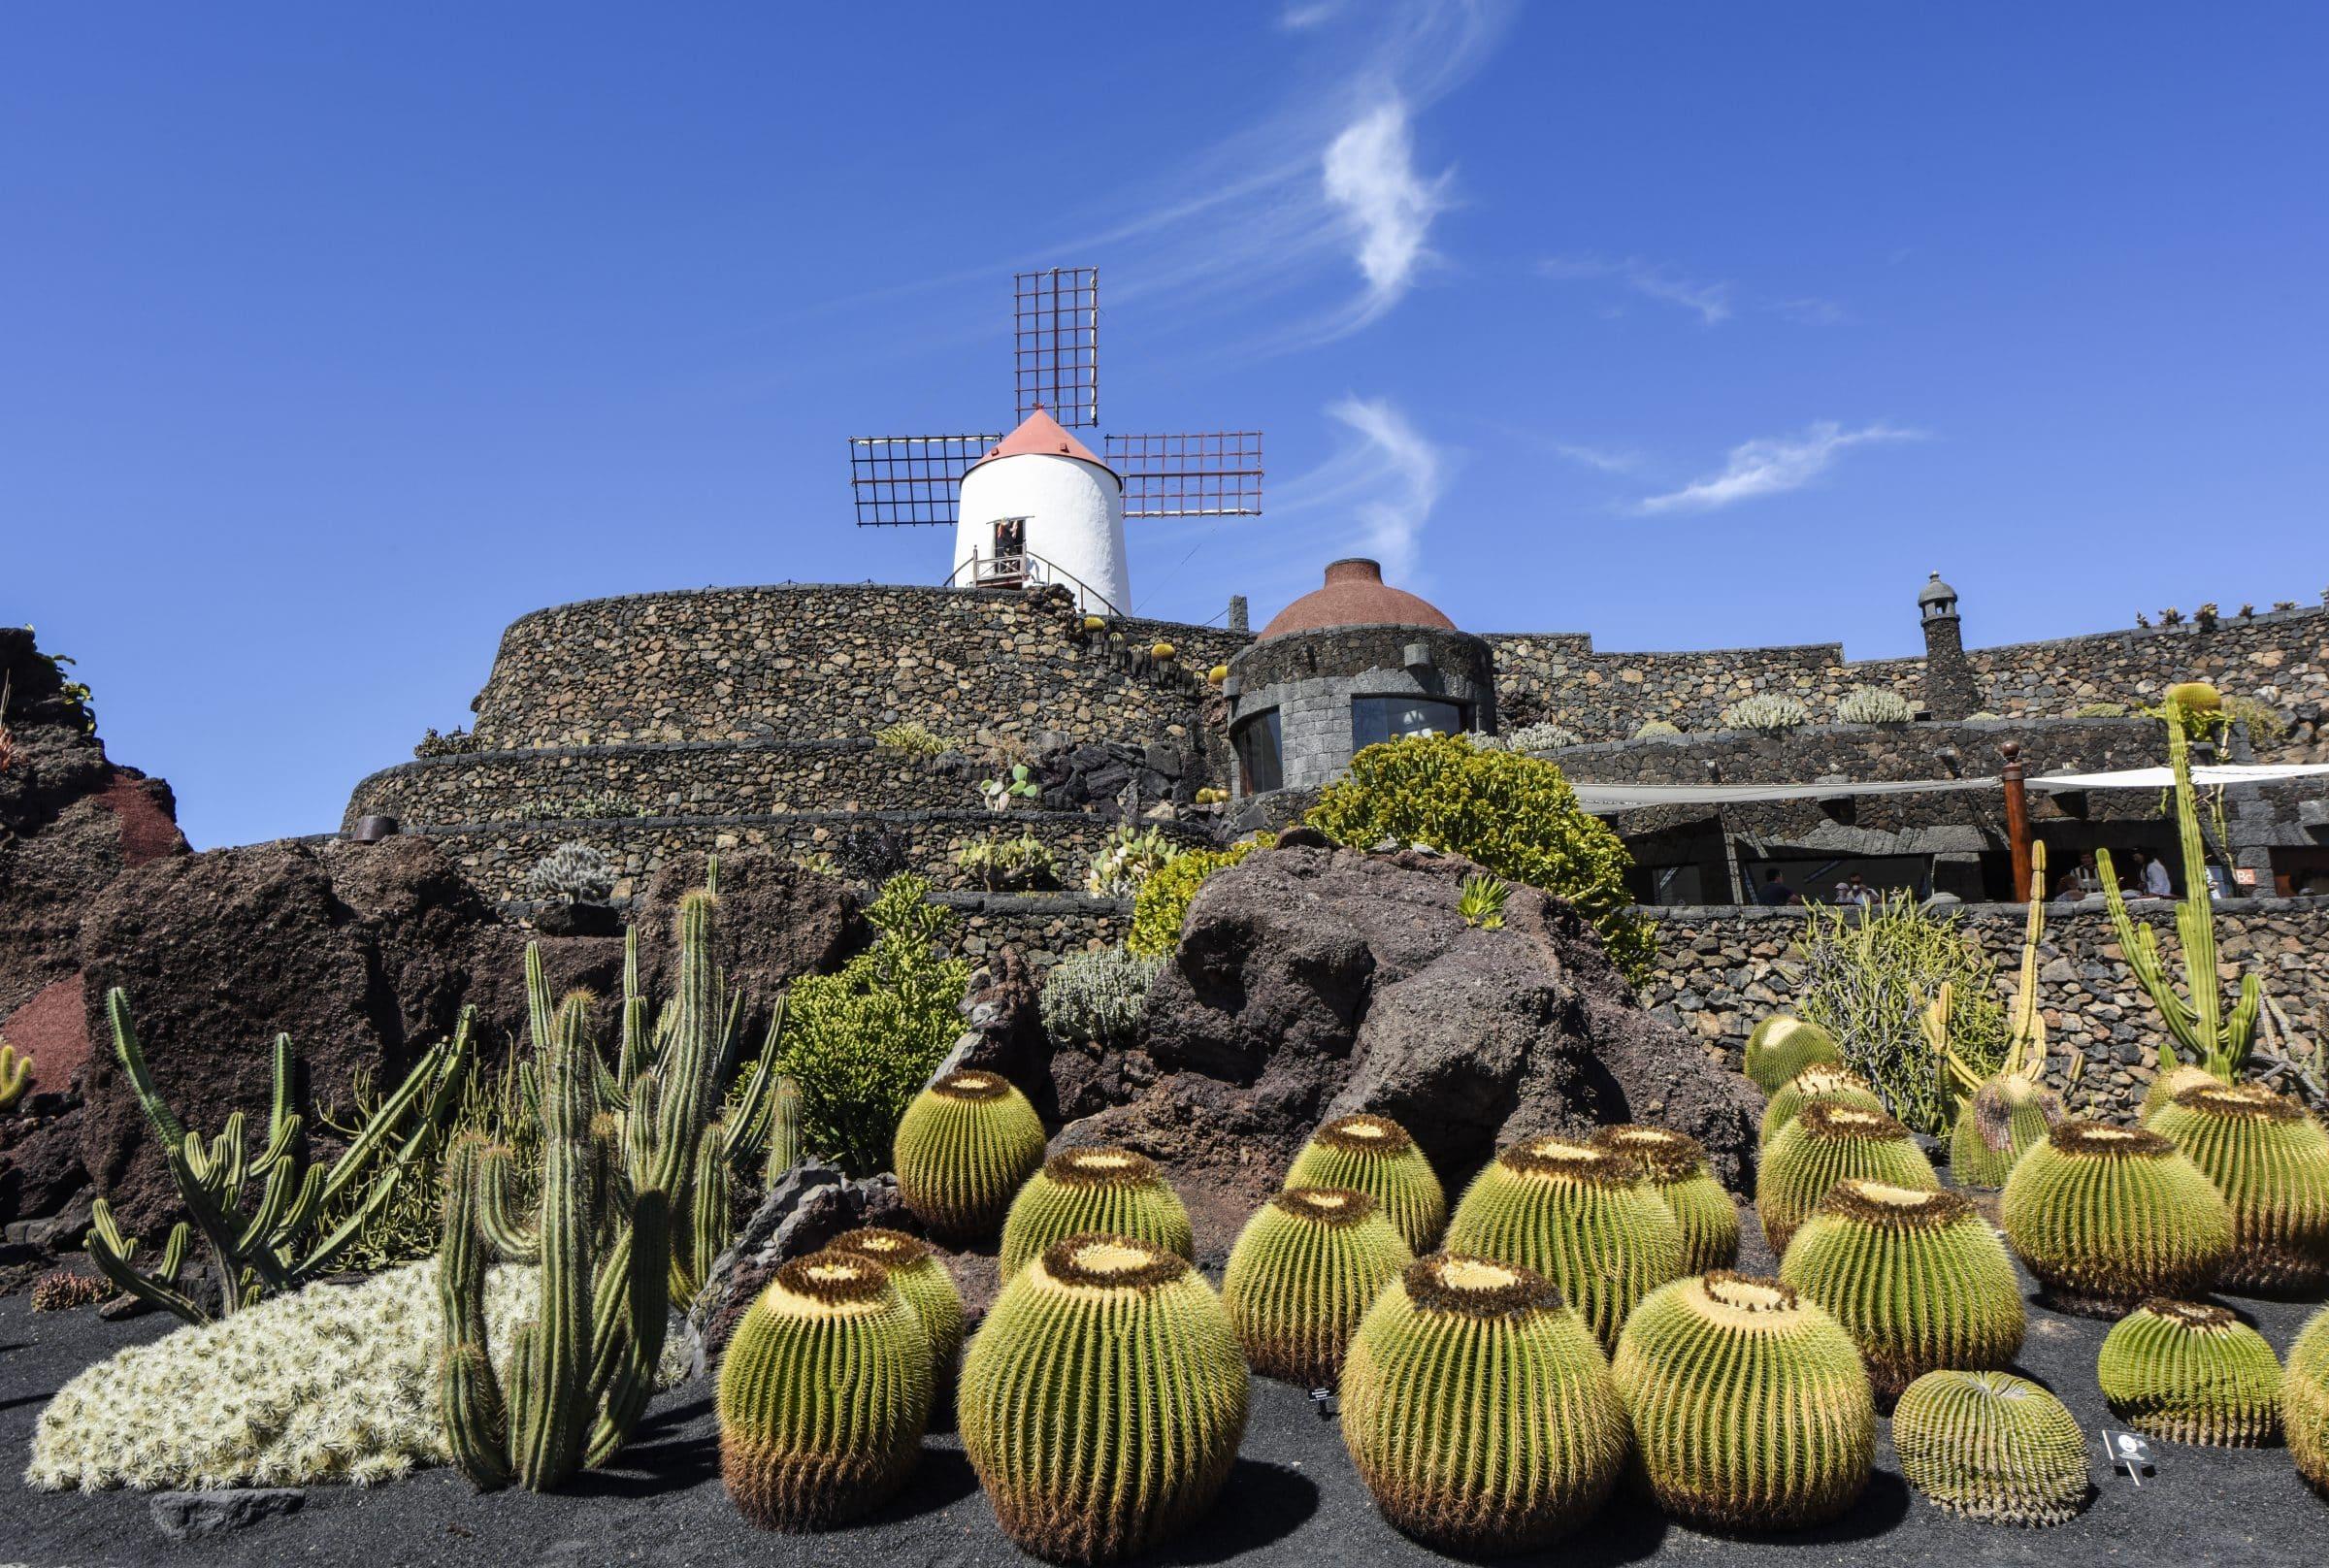 Jardin de cactus for Jardin de cactus lanzarote